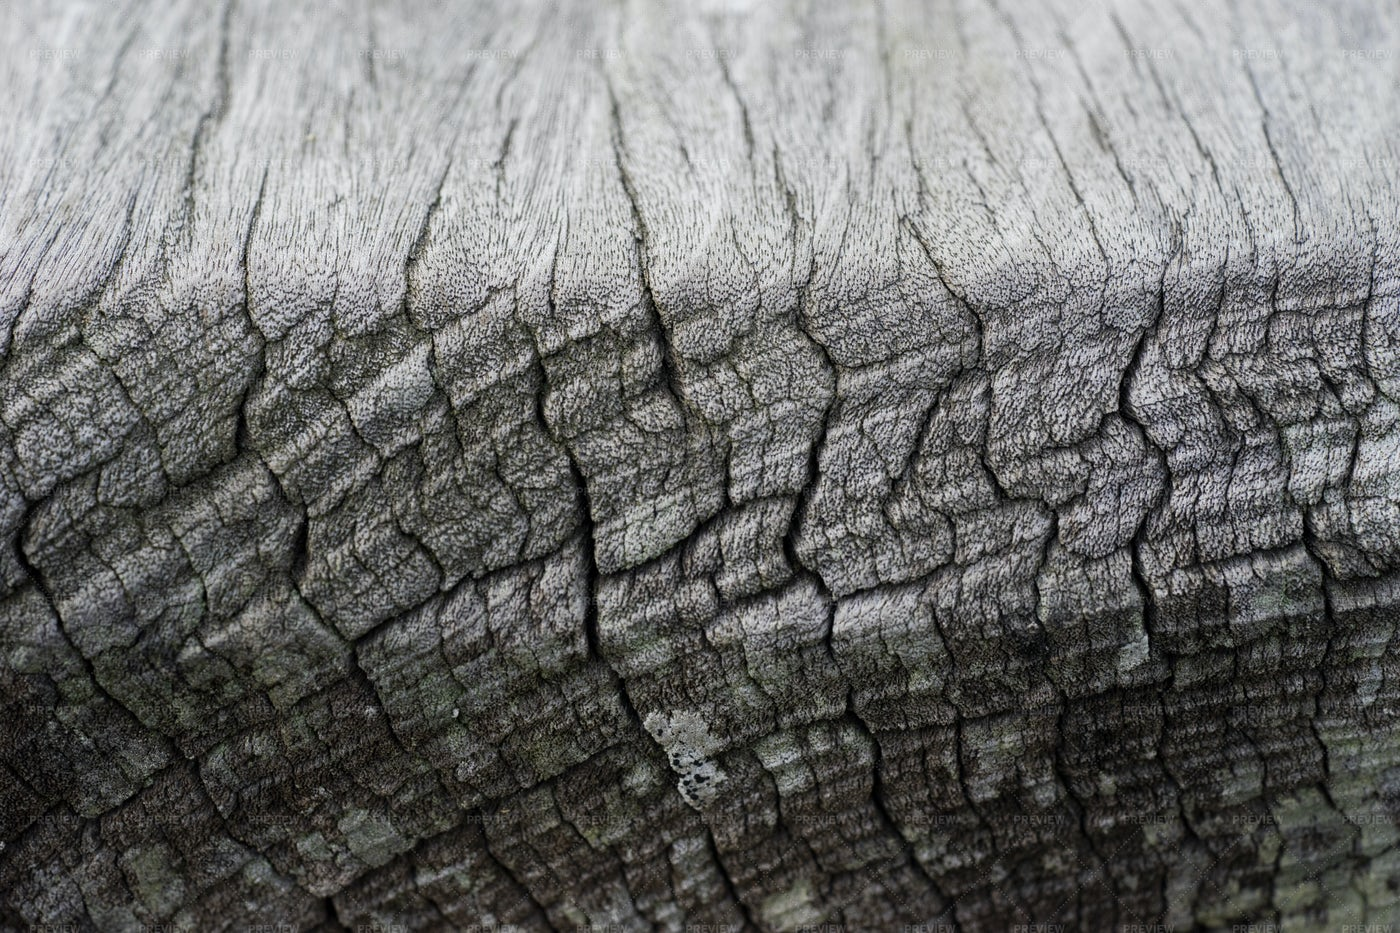 Cracked Wood Texture: Stock Photos